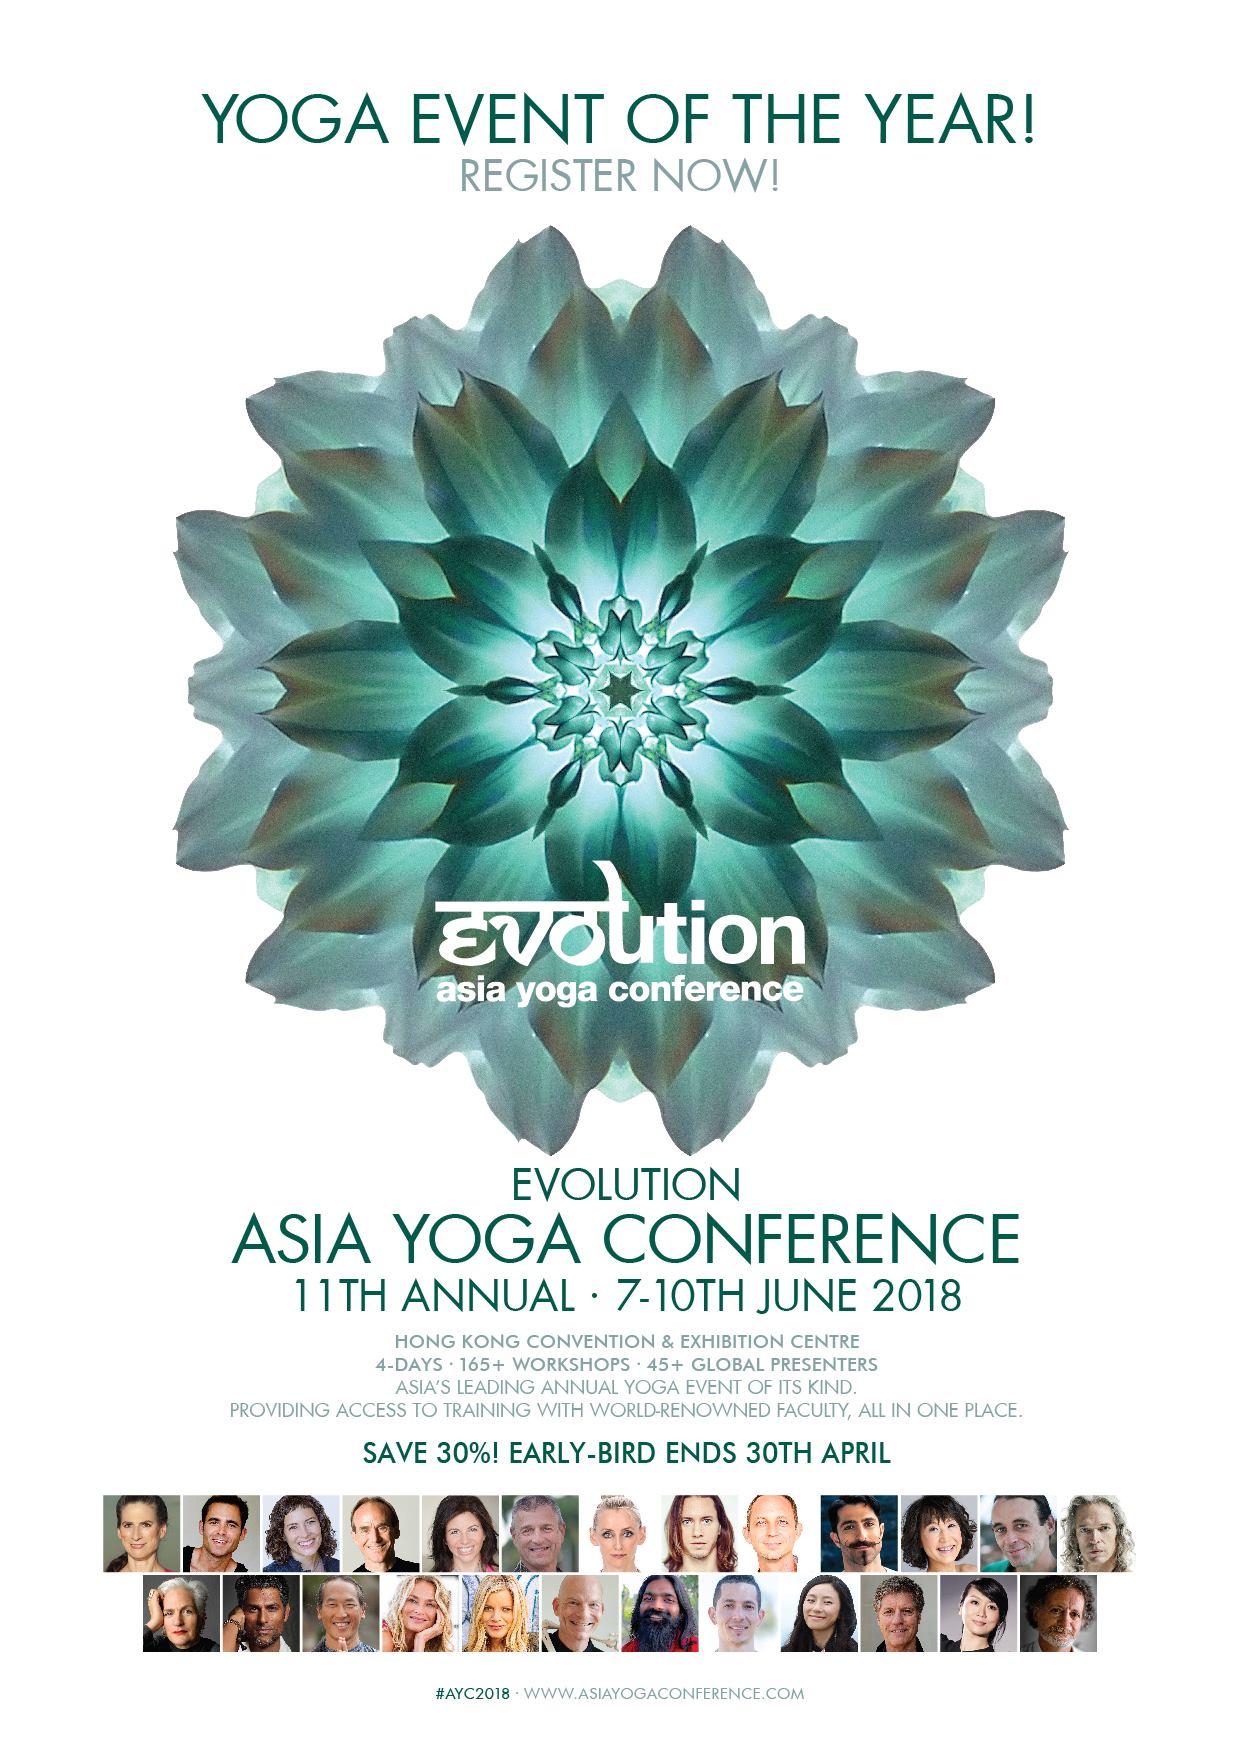 Evolution Asia Yoga Conference 2018.jpg